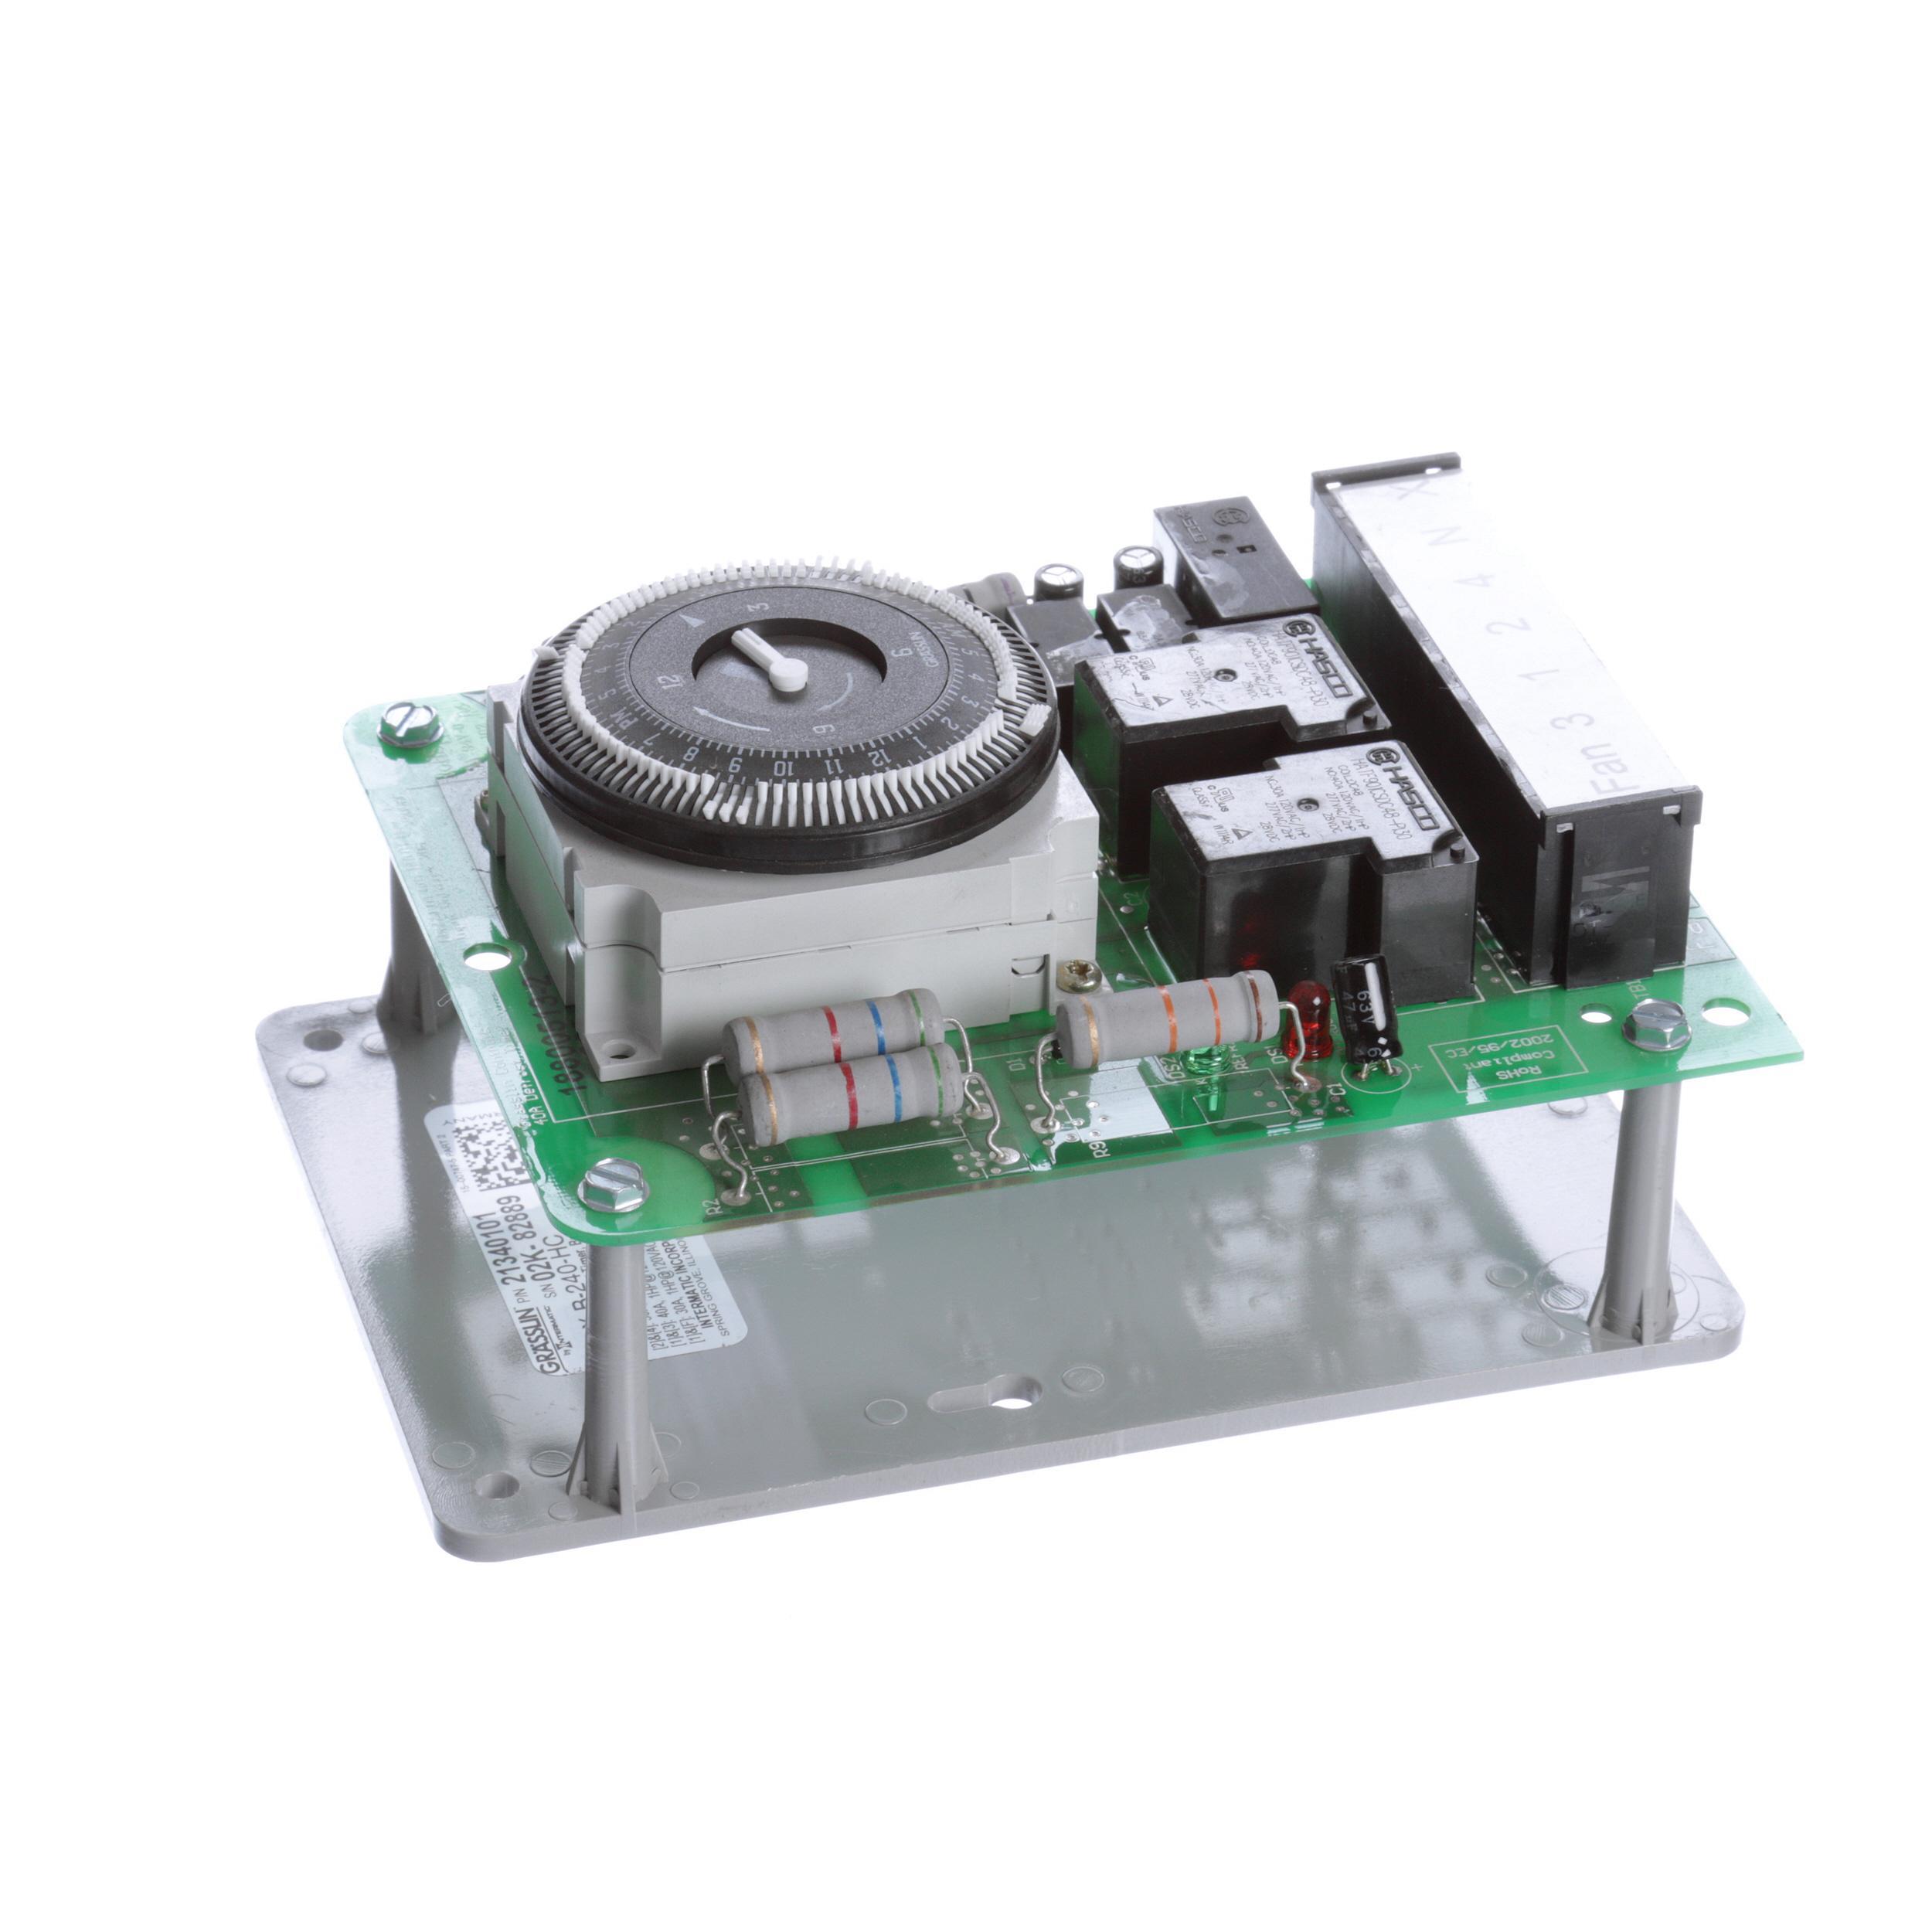 21340101 Timer Wiring Diagram For Defrost Worksheet And Yale Glc Heatcraft 40 Amp 230v 60hz Dtsx240 Part Rh Heritageparts Com